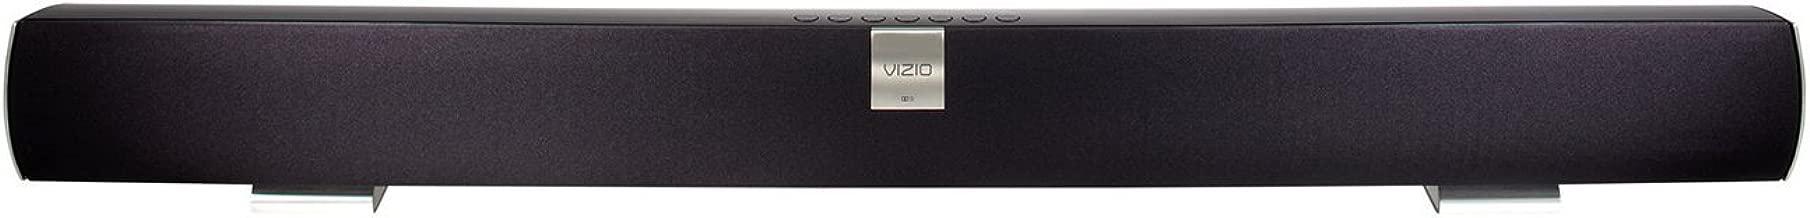 VIZIO VSB200 32